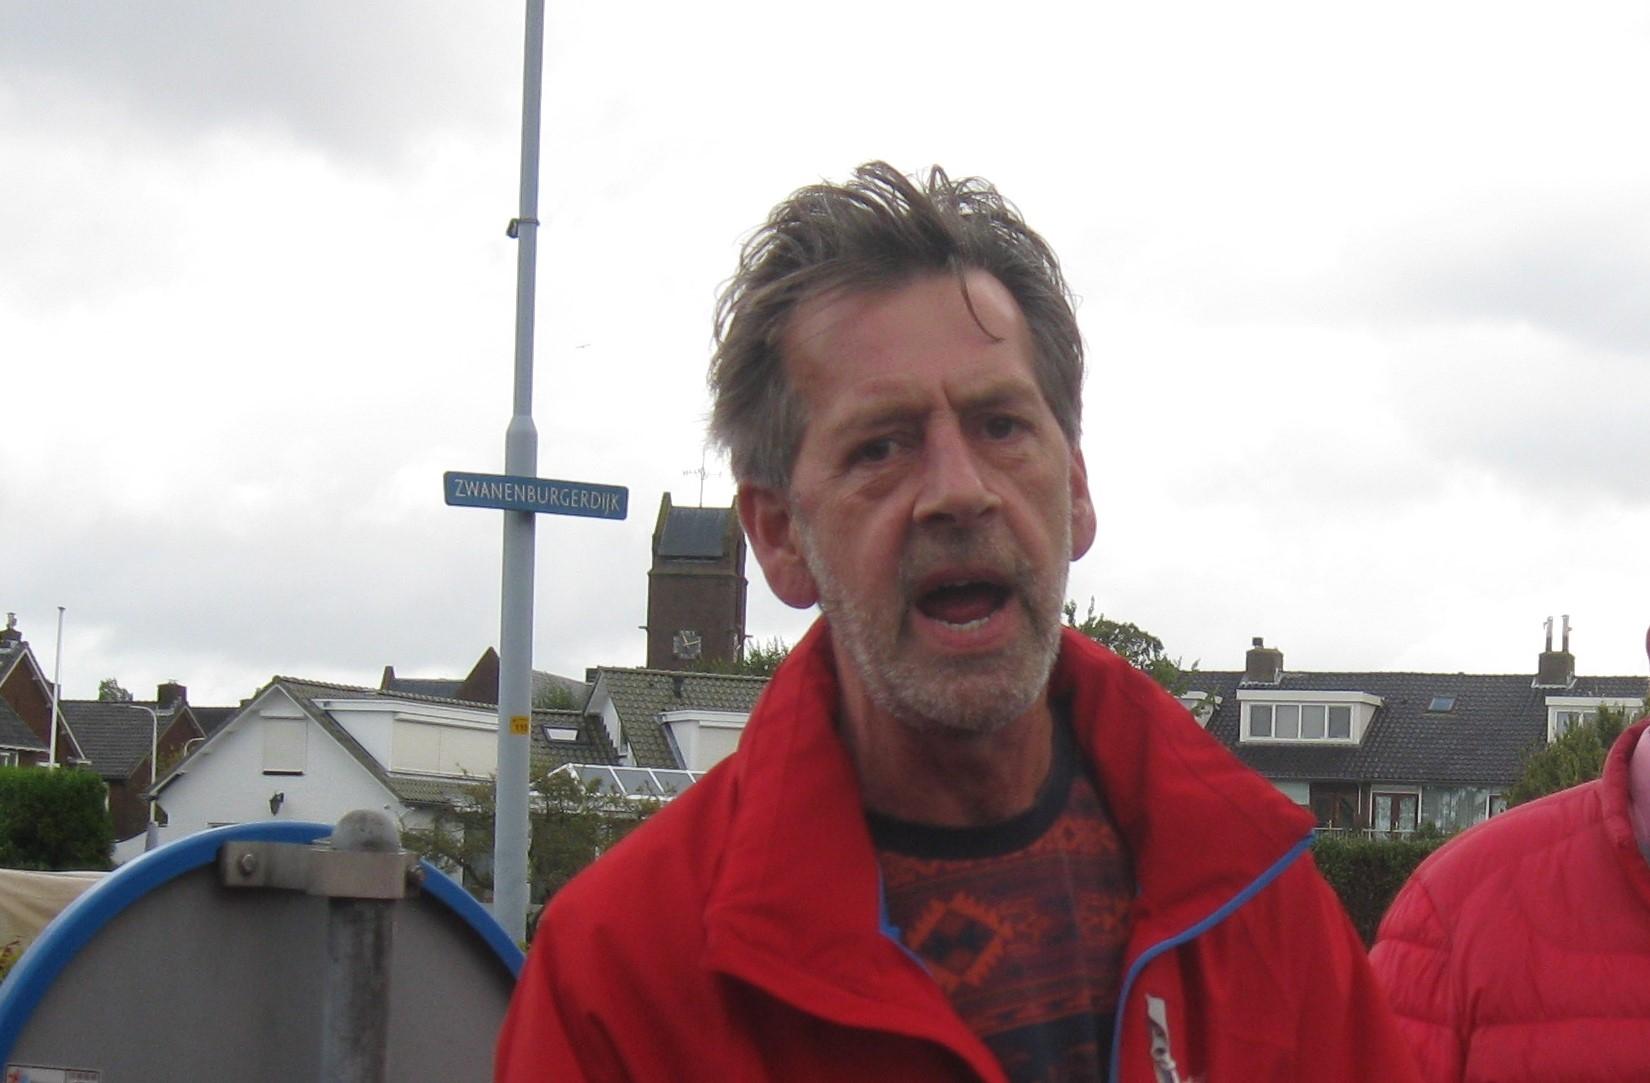 Presentator Gerard van Houwelingen Leo Kranenburg © BDU media